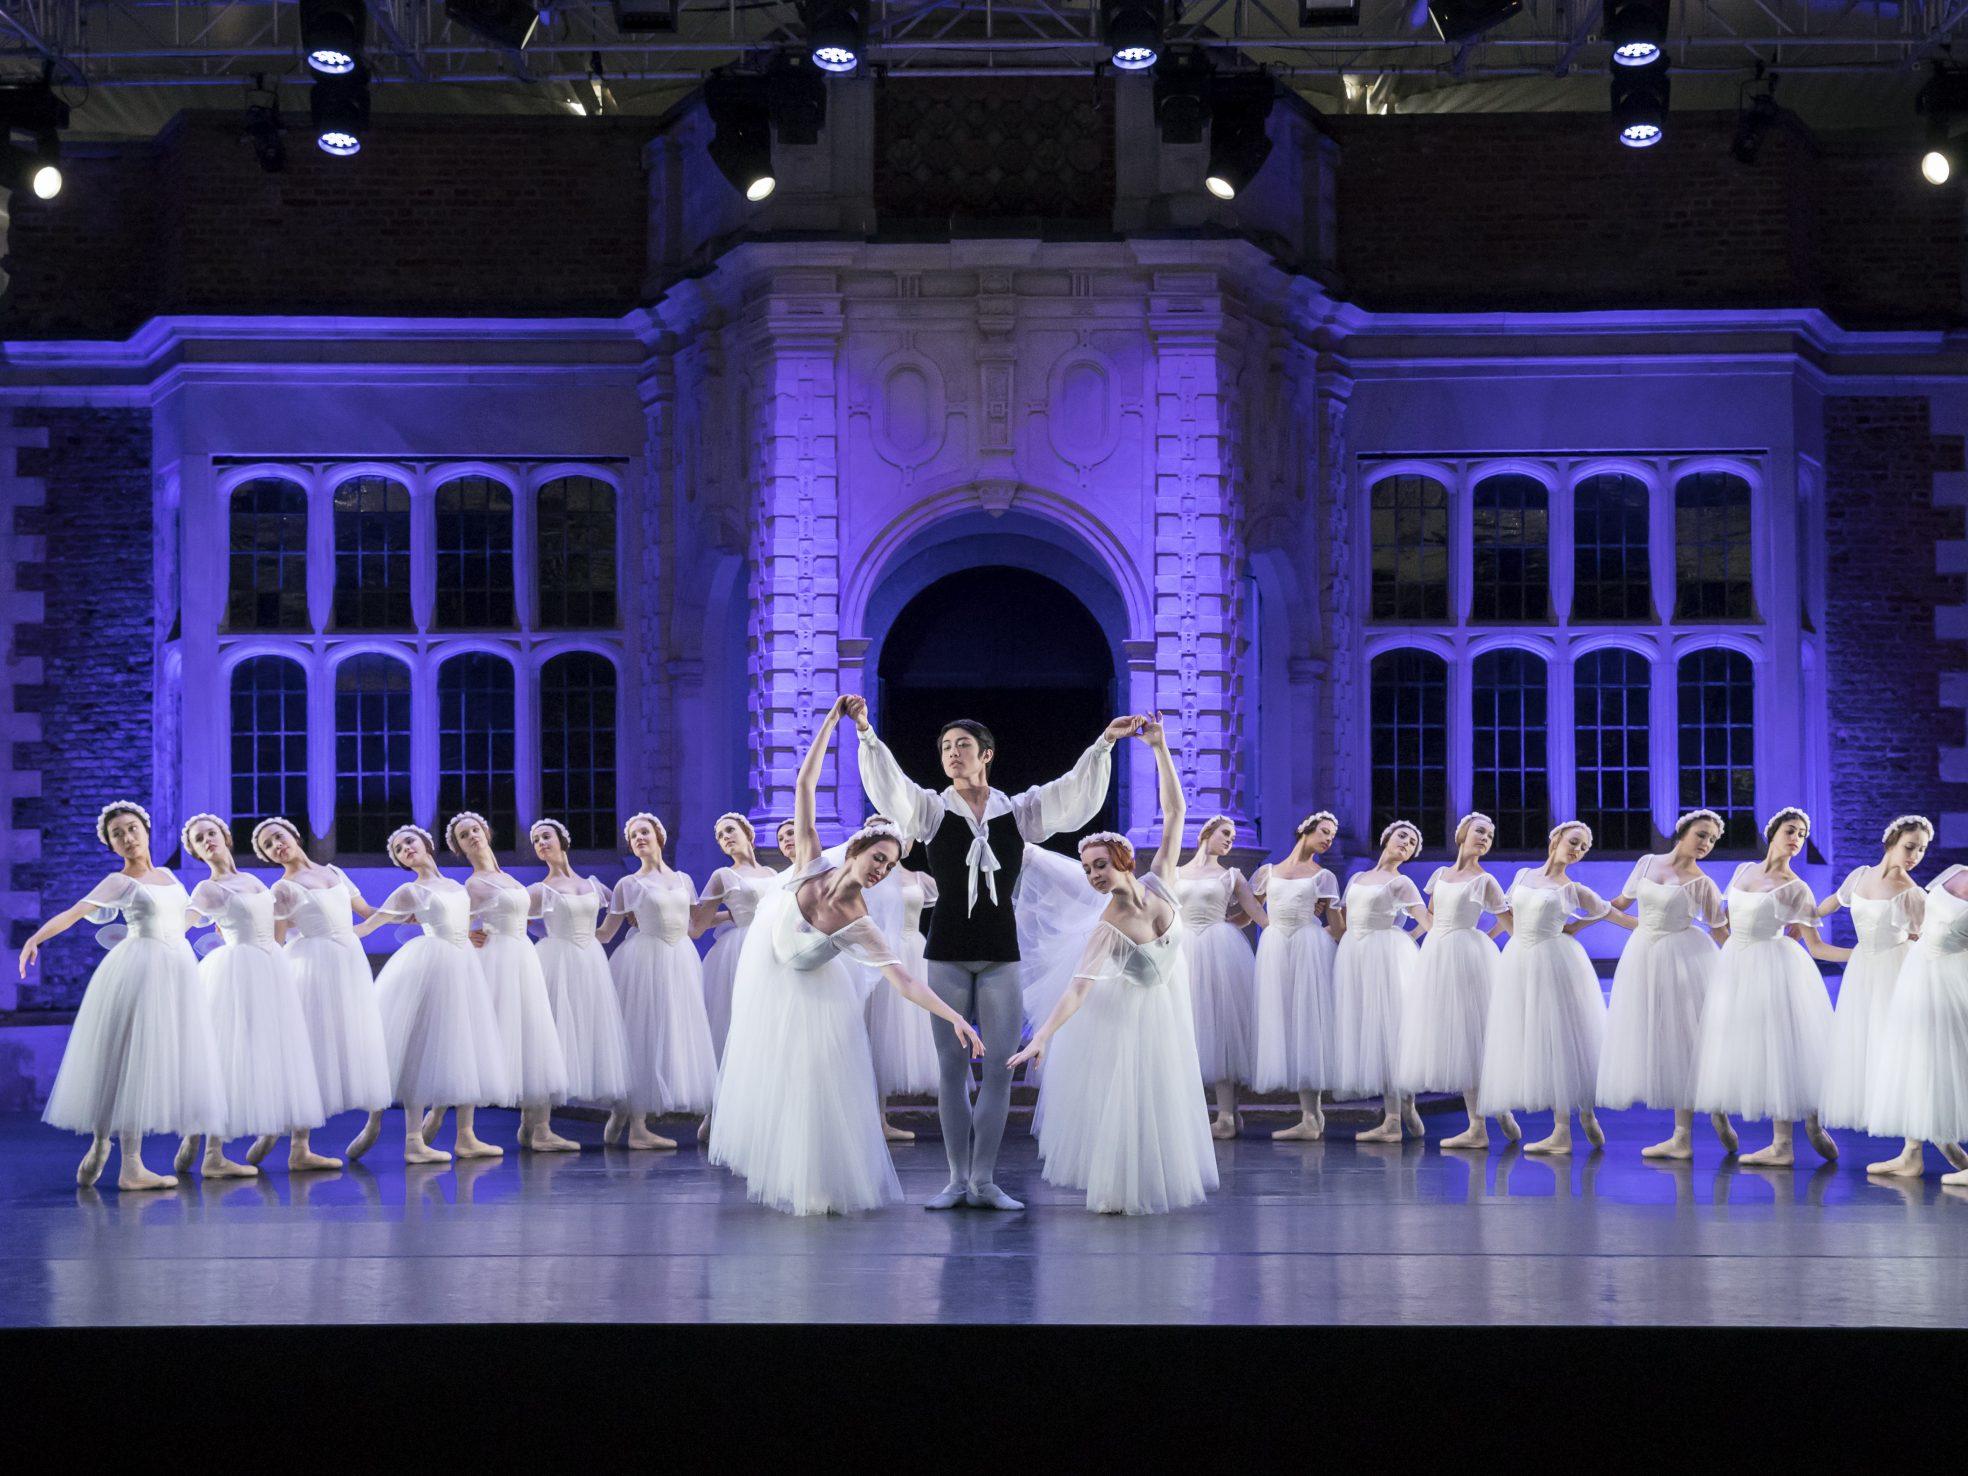 The Royal Ballet School